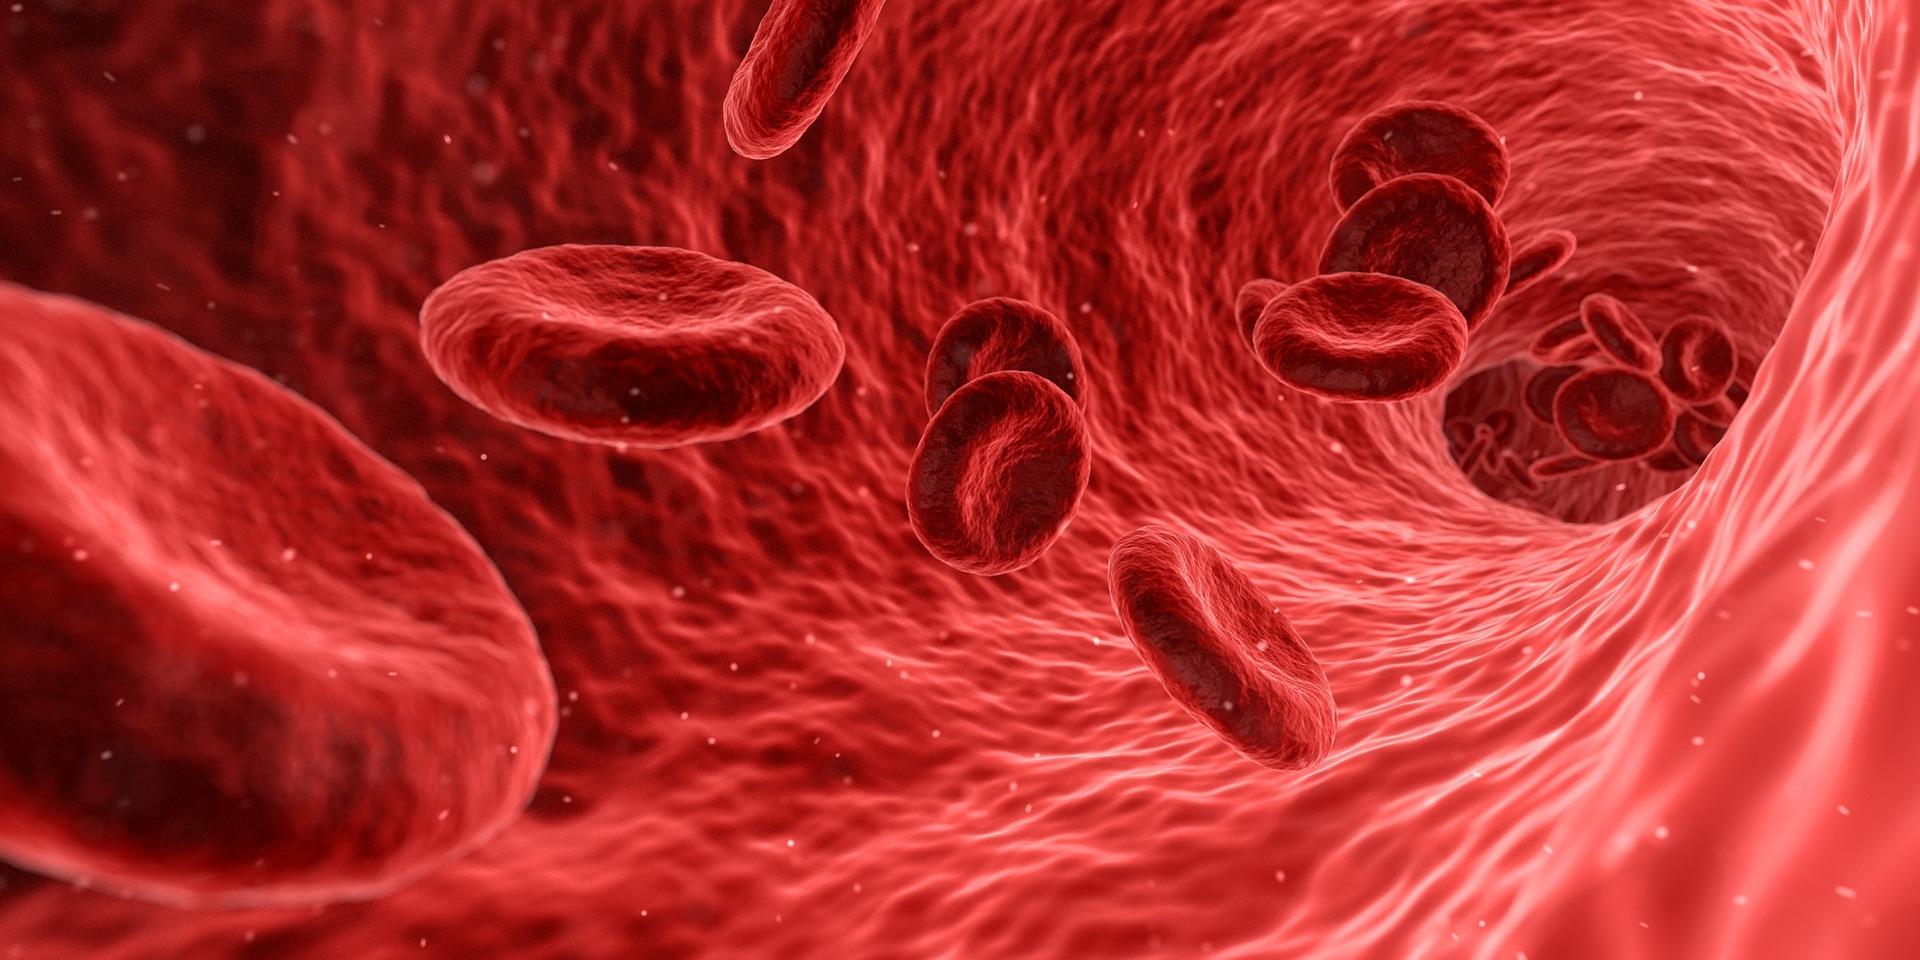 z ceho je anemie